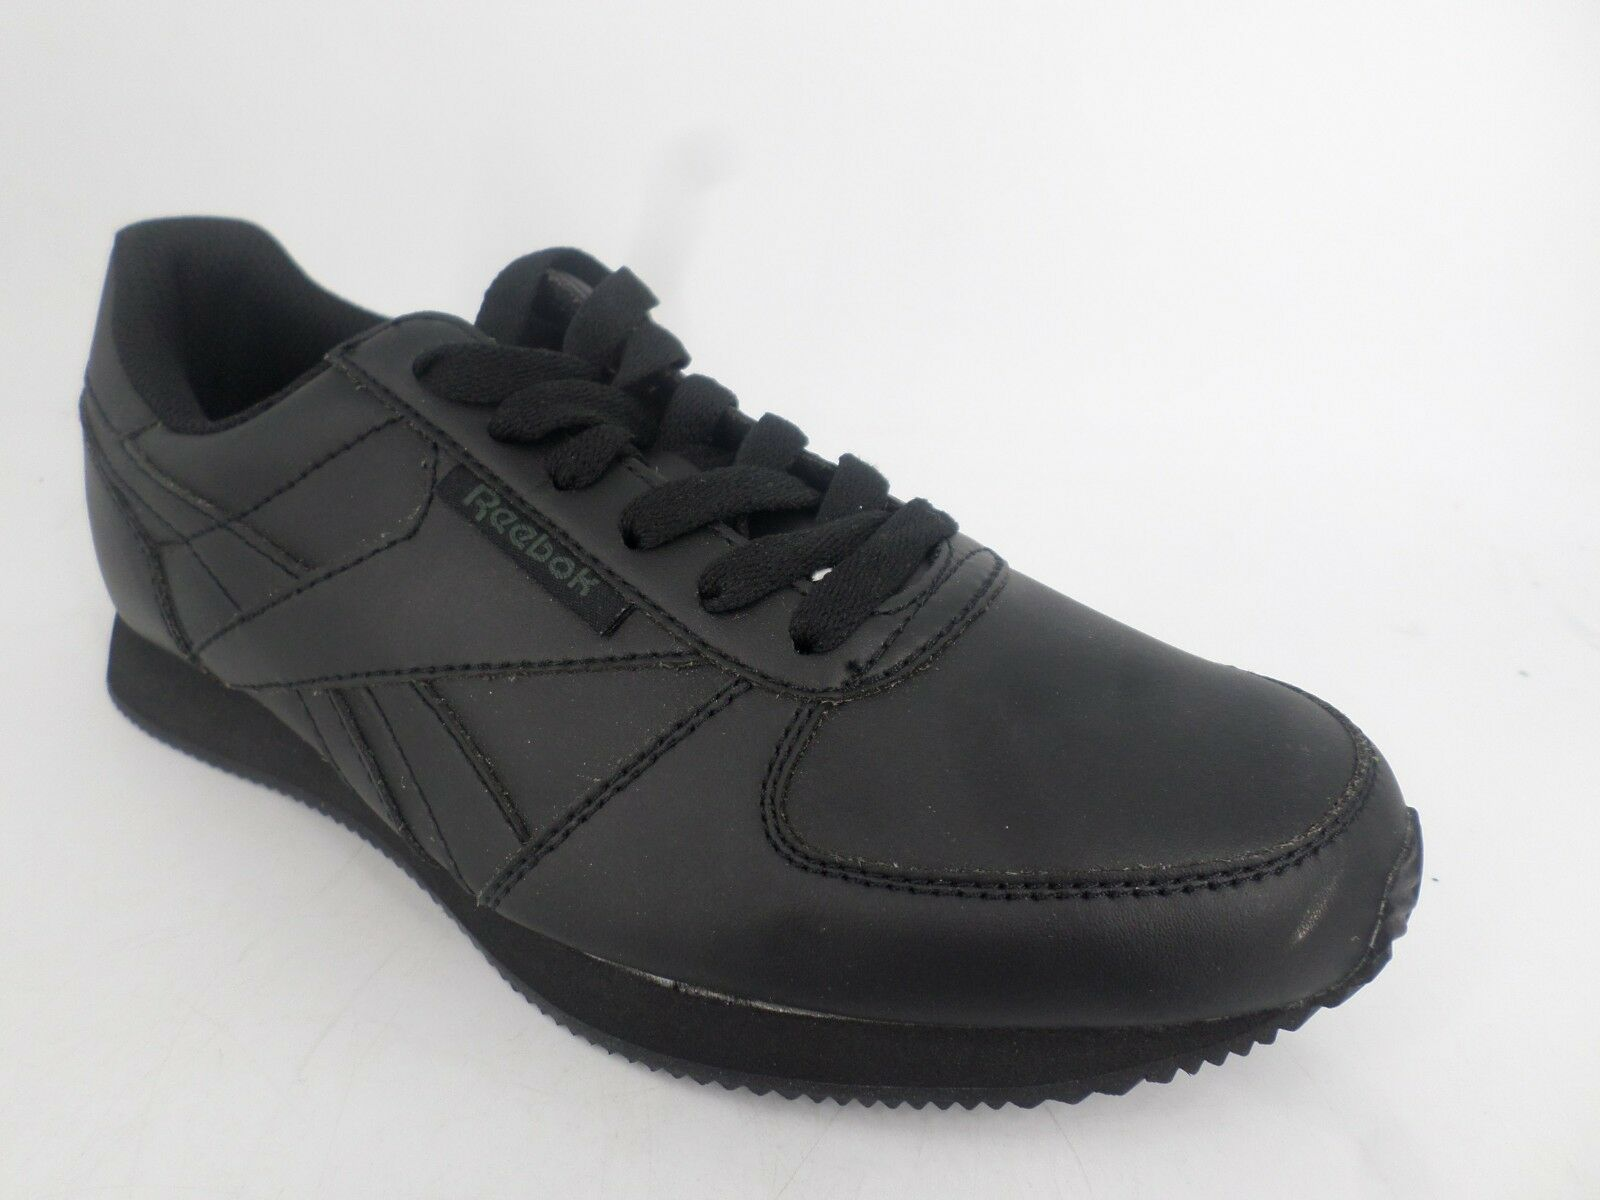 Reebok Classic Black Lace Up Trainers UK 5 EU 38 LN088 AD 11